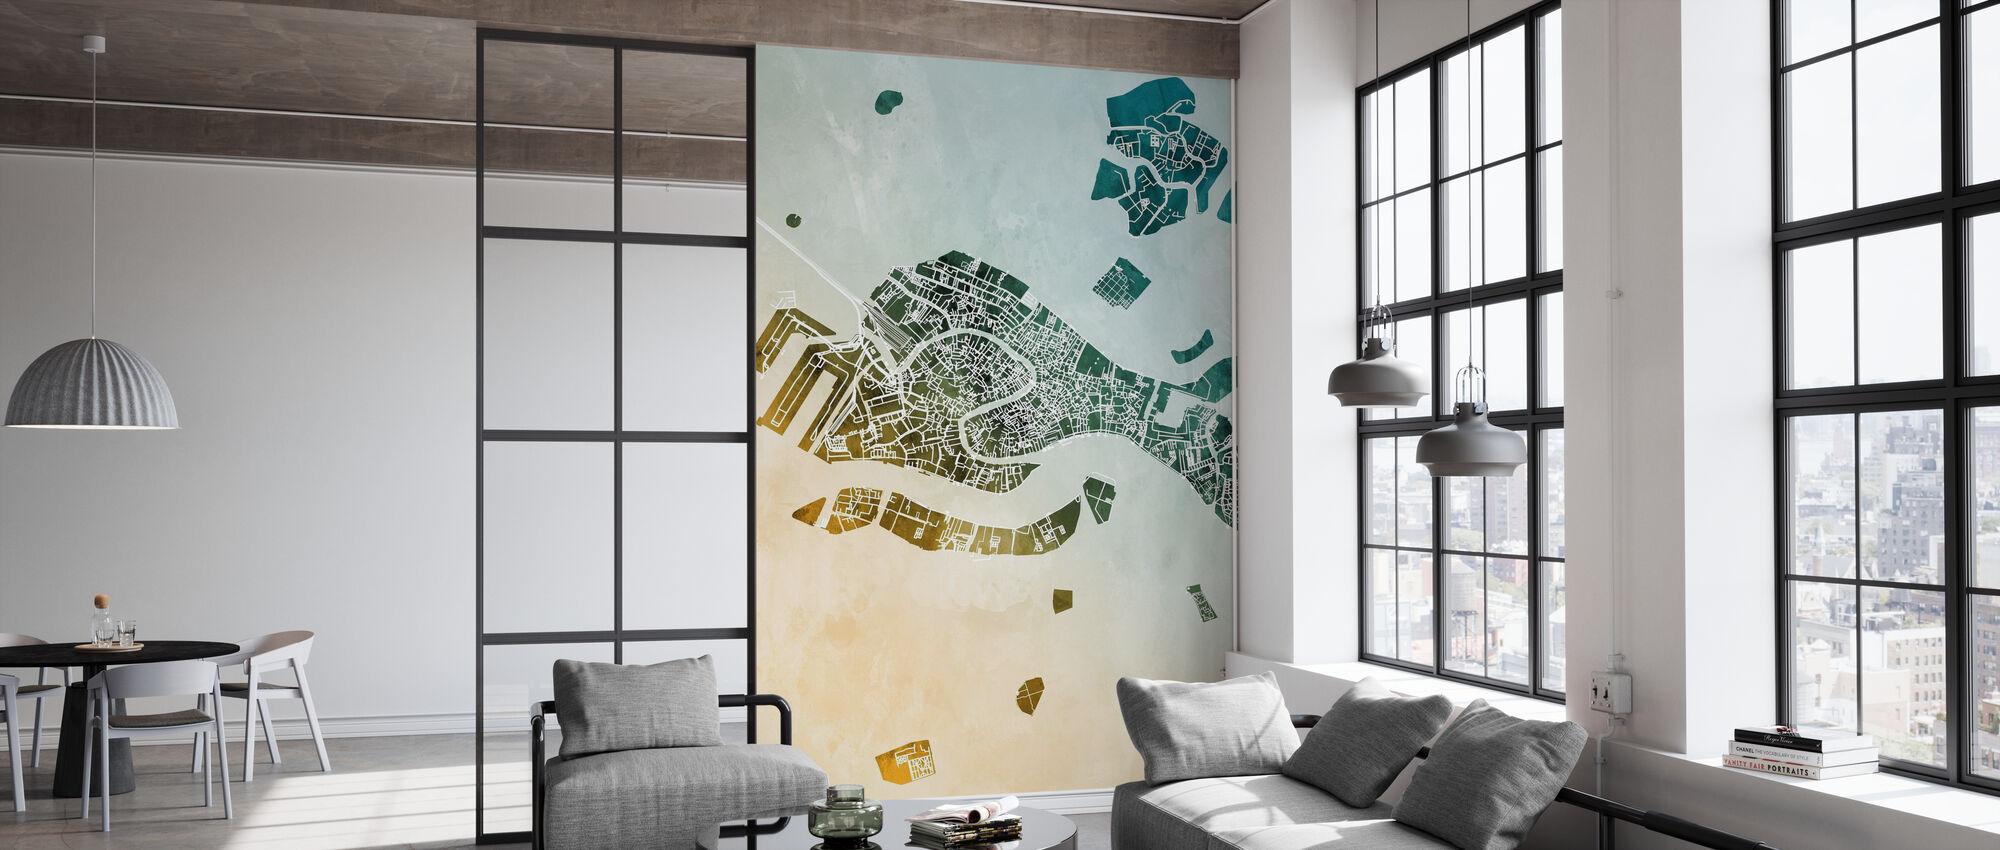 Venice Italy City Map - Wallpaper - Office